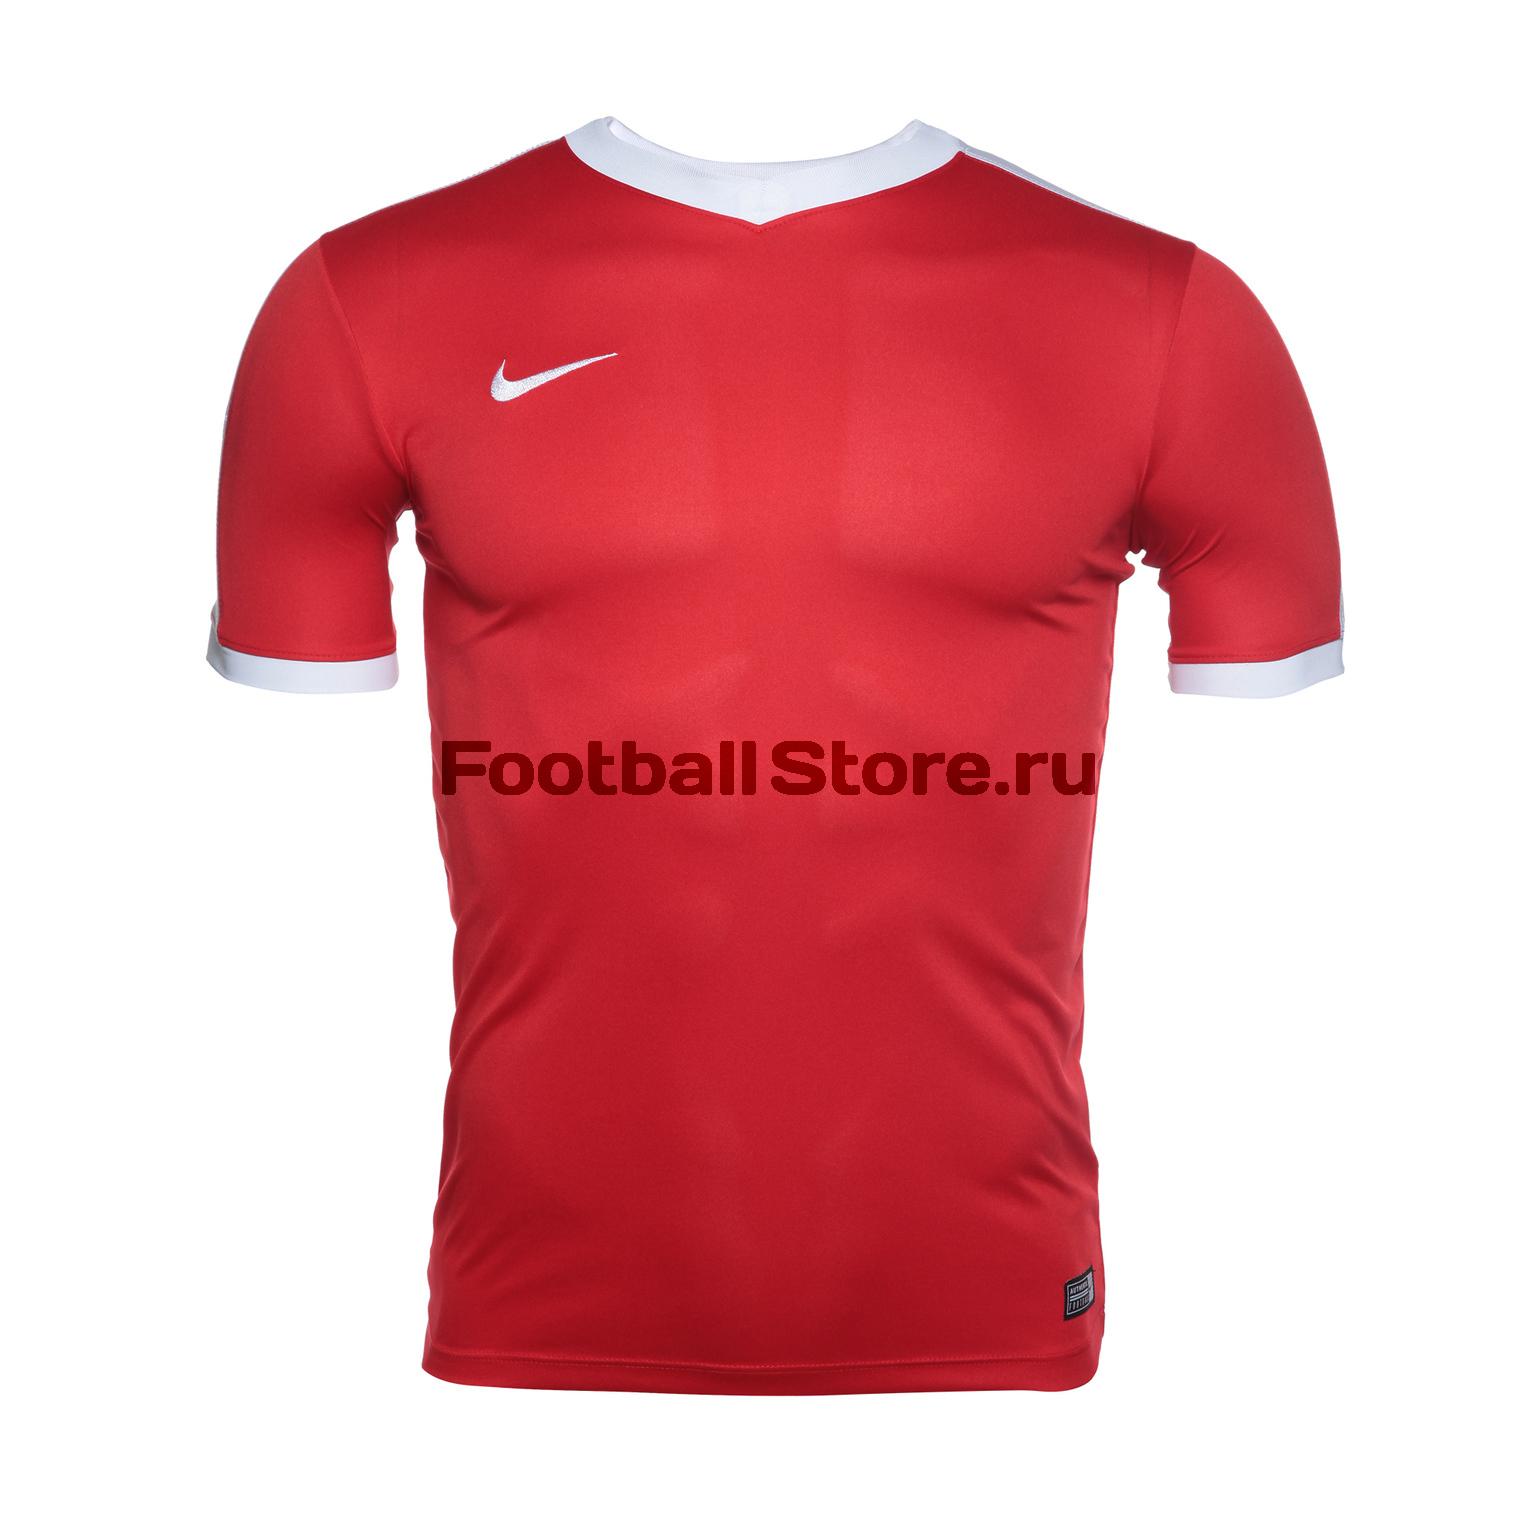 Игровая форма Nike Футболка подростковая Nike Striker IV JSY 725974-657 в киеве в кредит hatsan striker 1000s